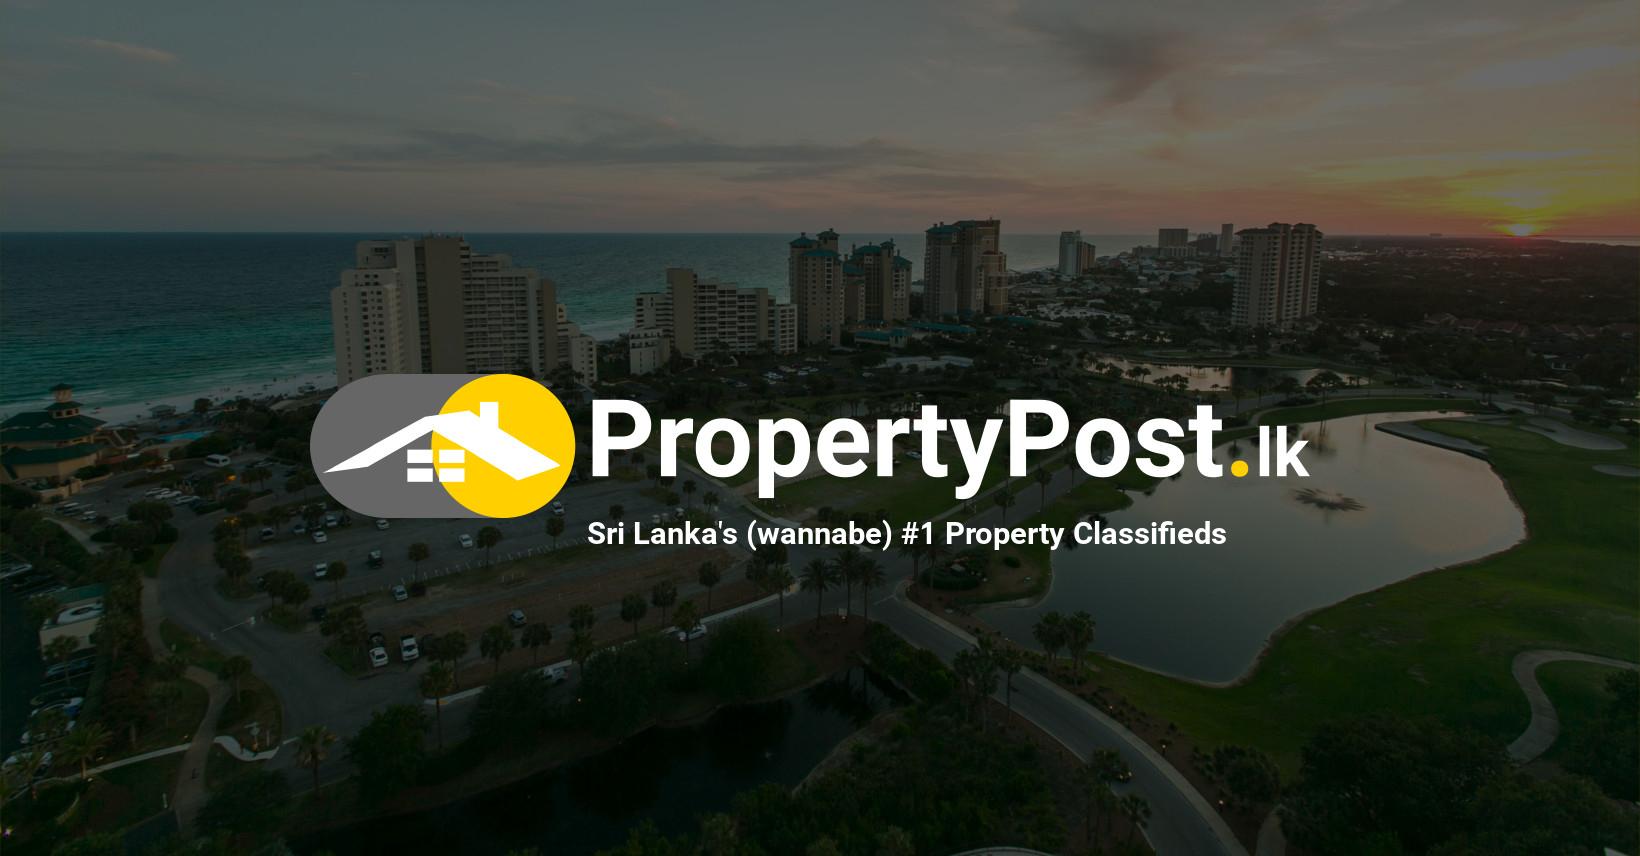 PropertyPost-lk